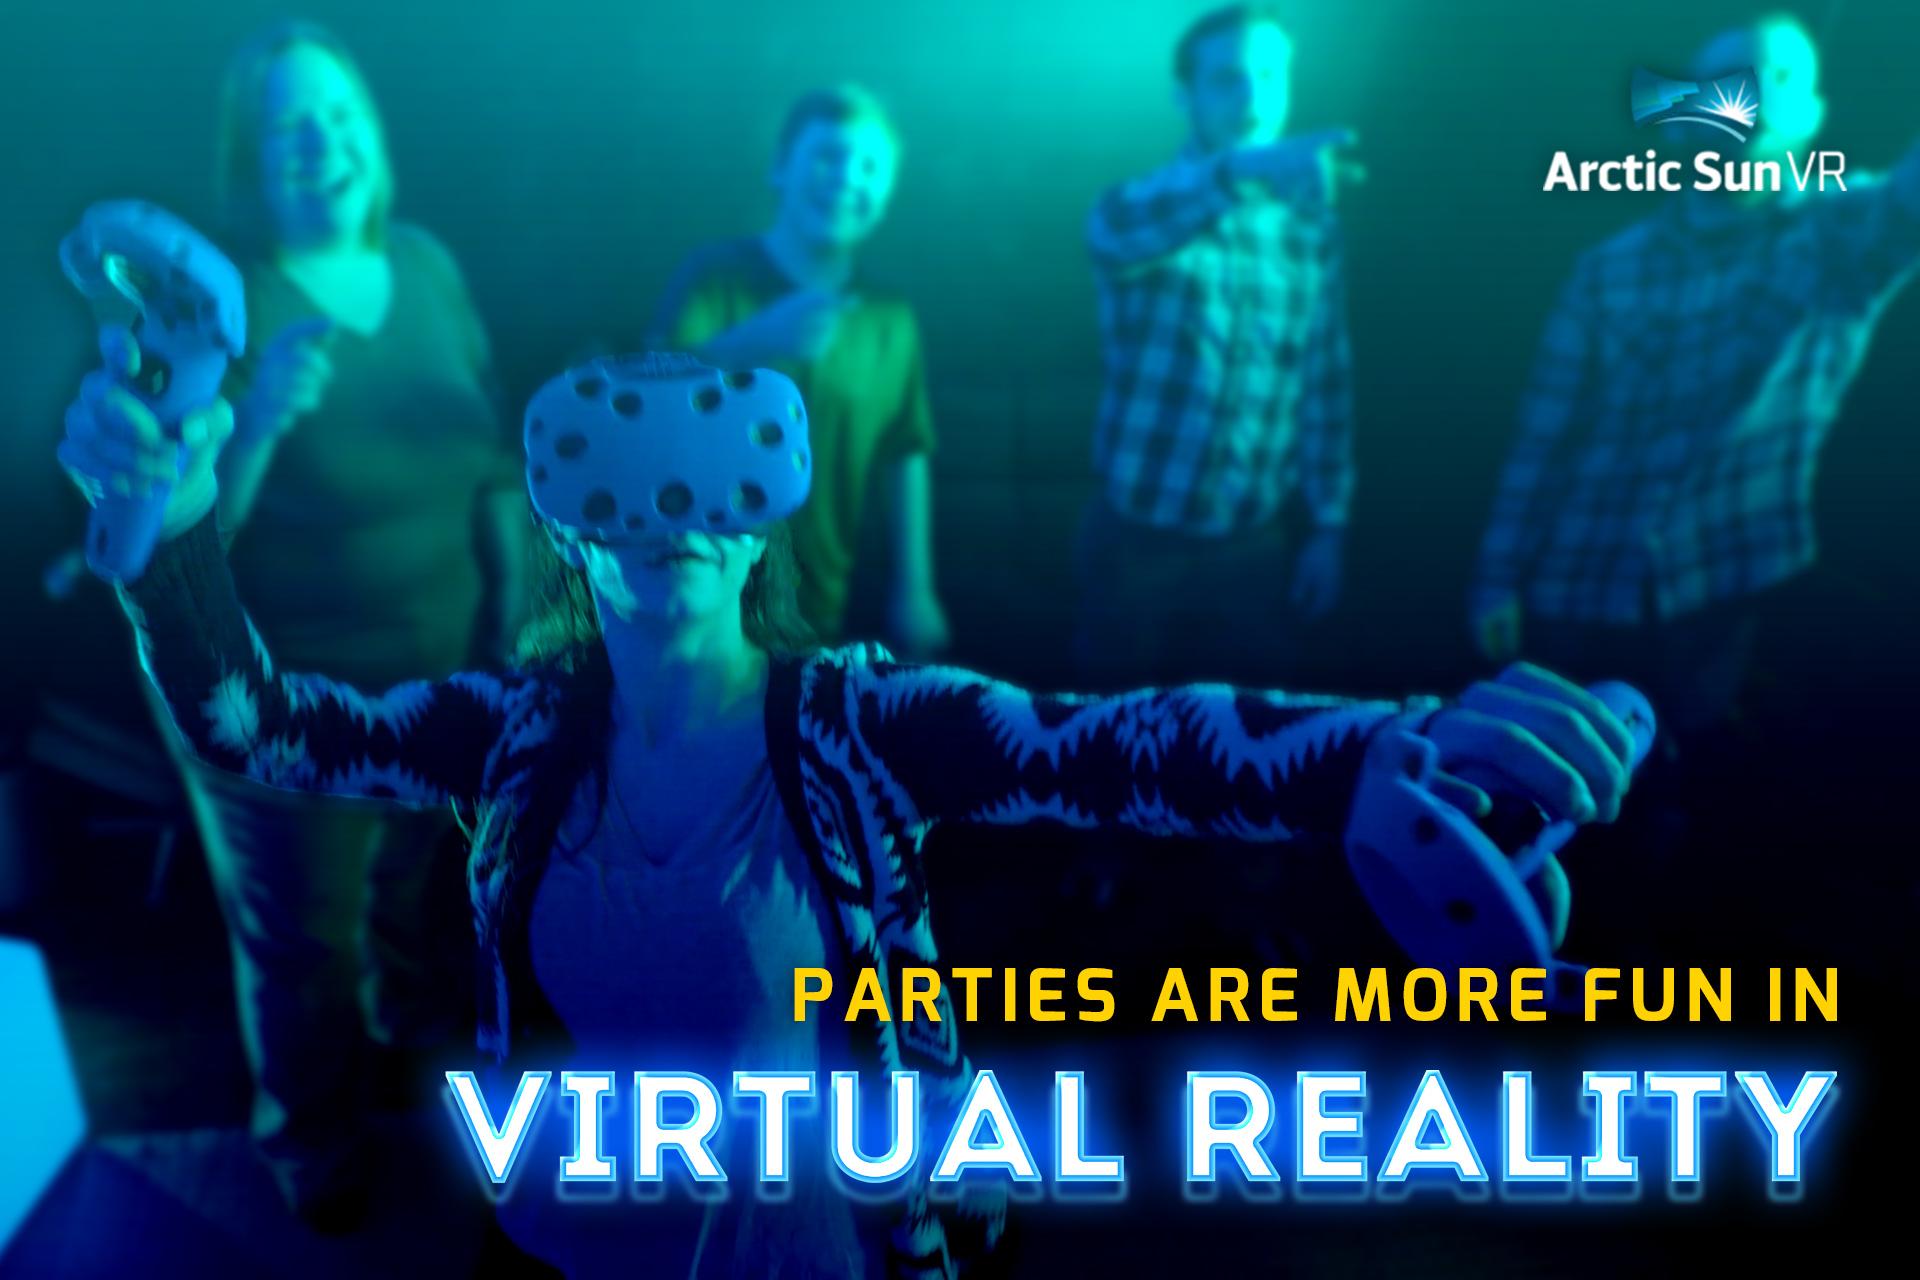 Arctic-Sun-VR-PartiesEvents-5.jpg